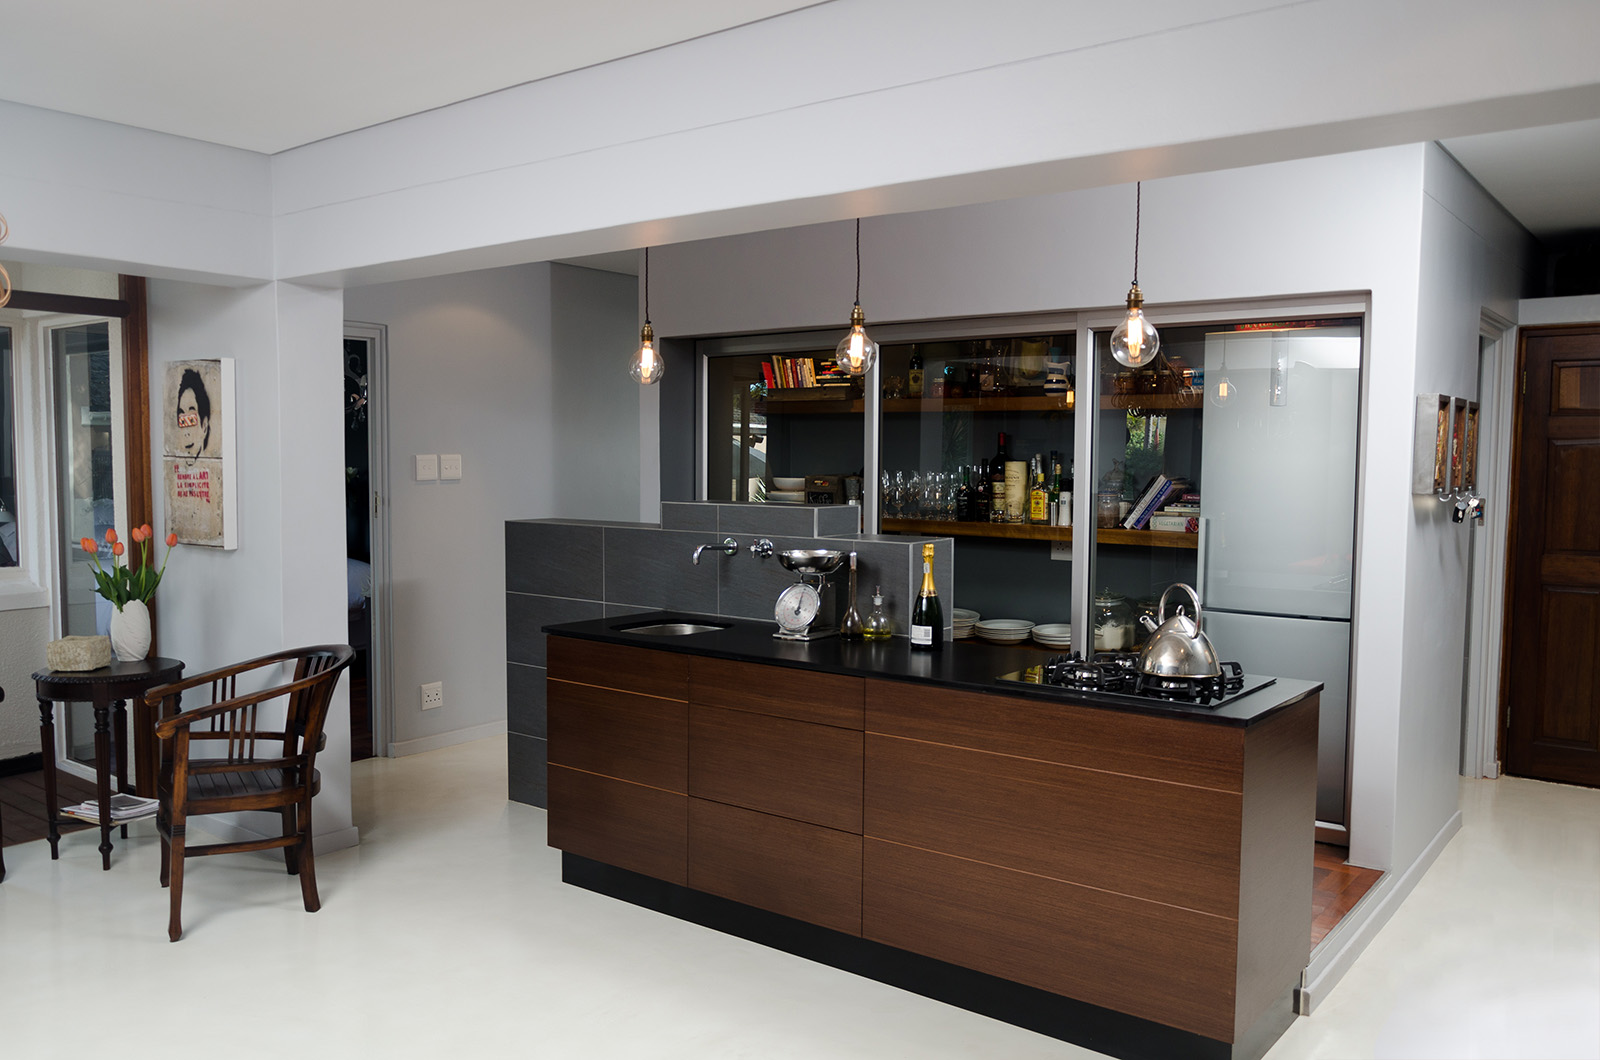 Greenpoint apartment - kitchen.jpg